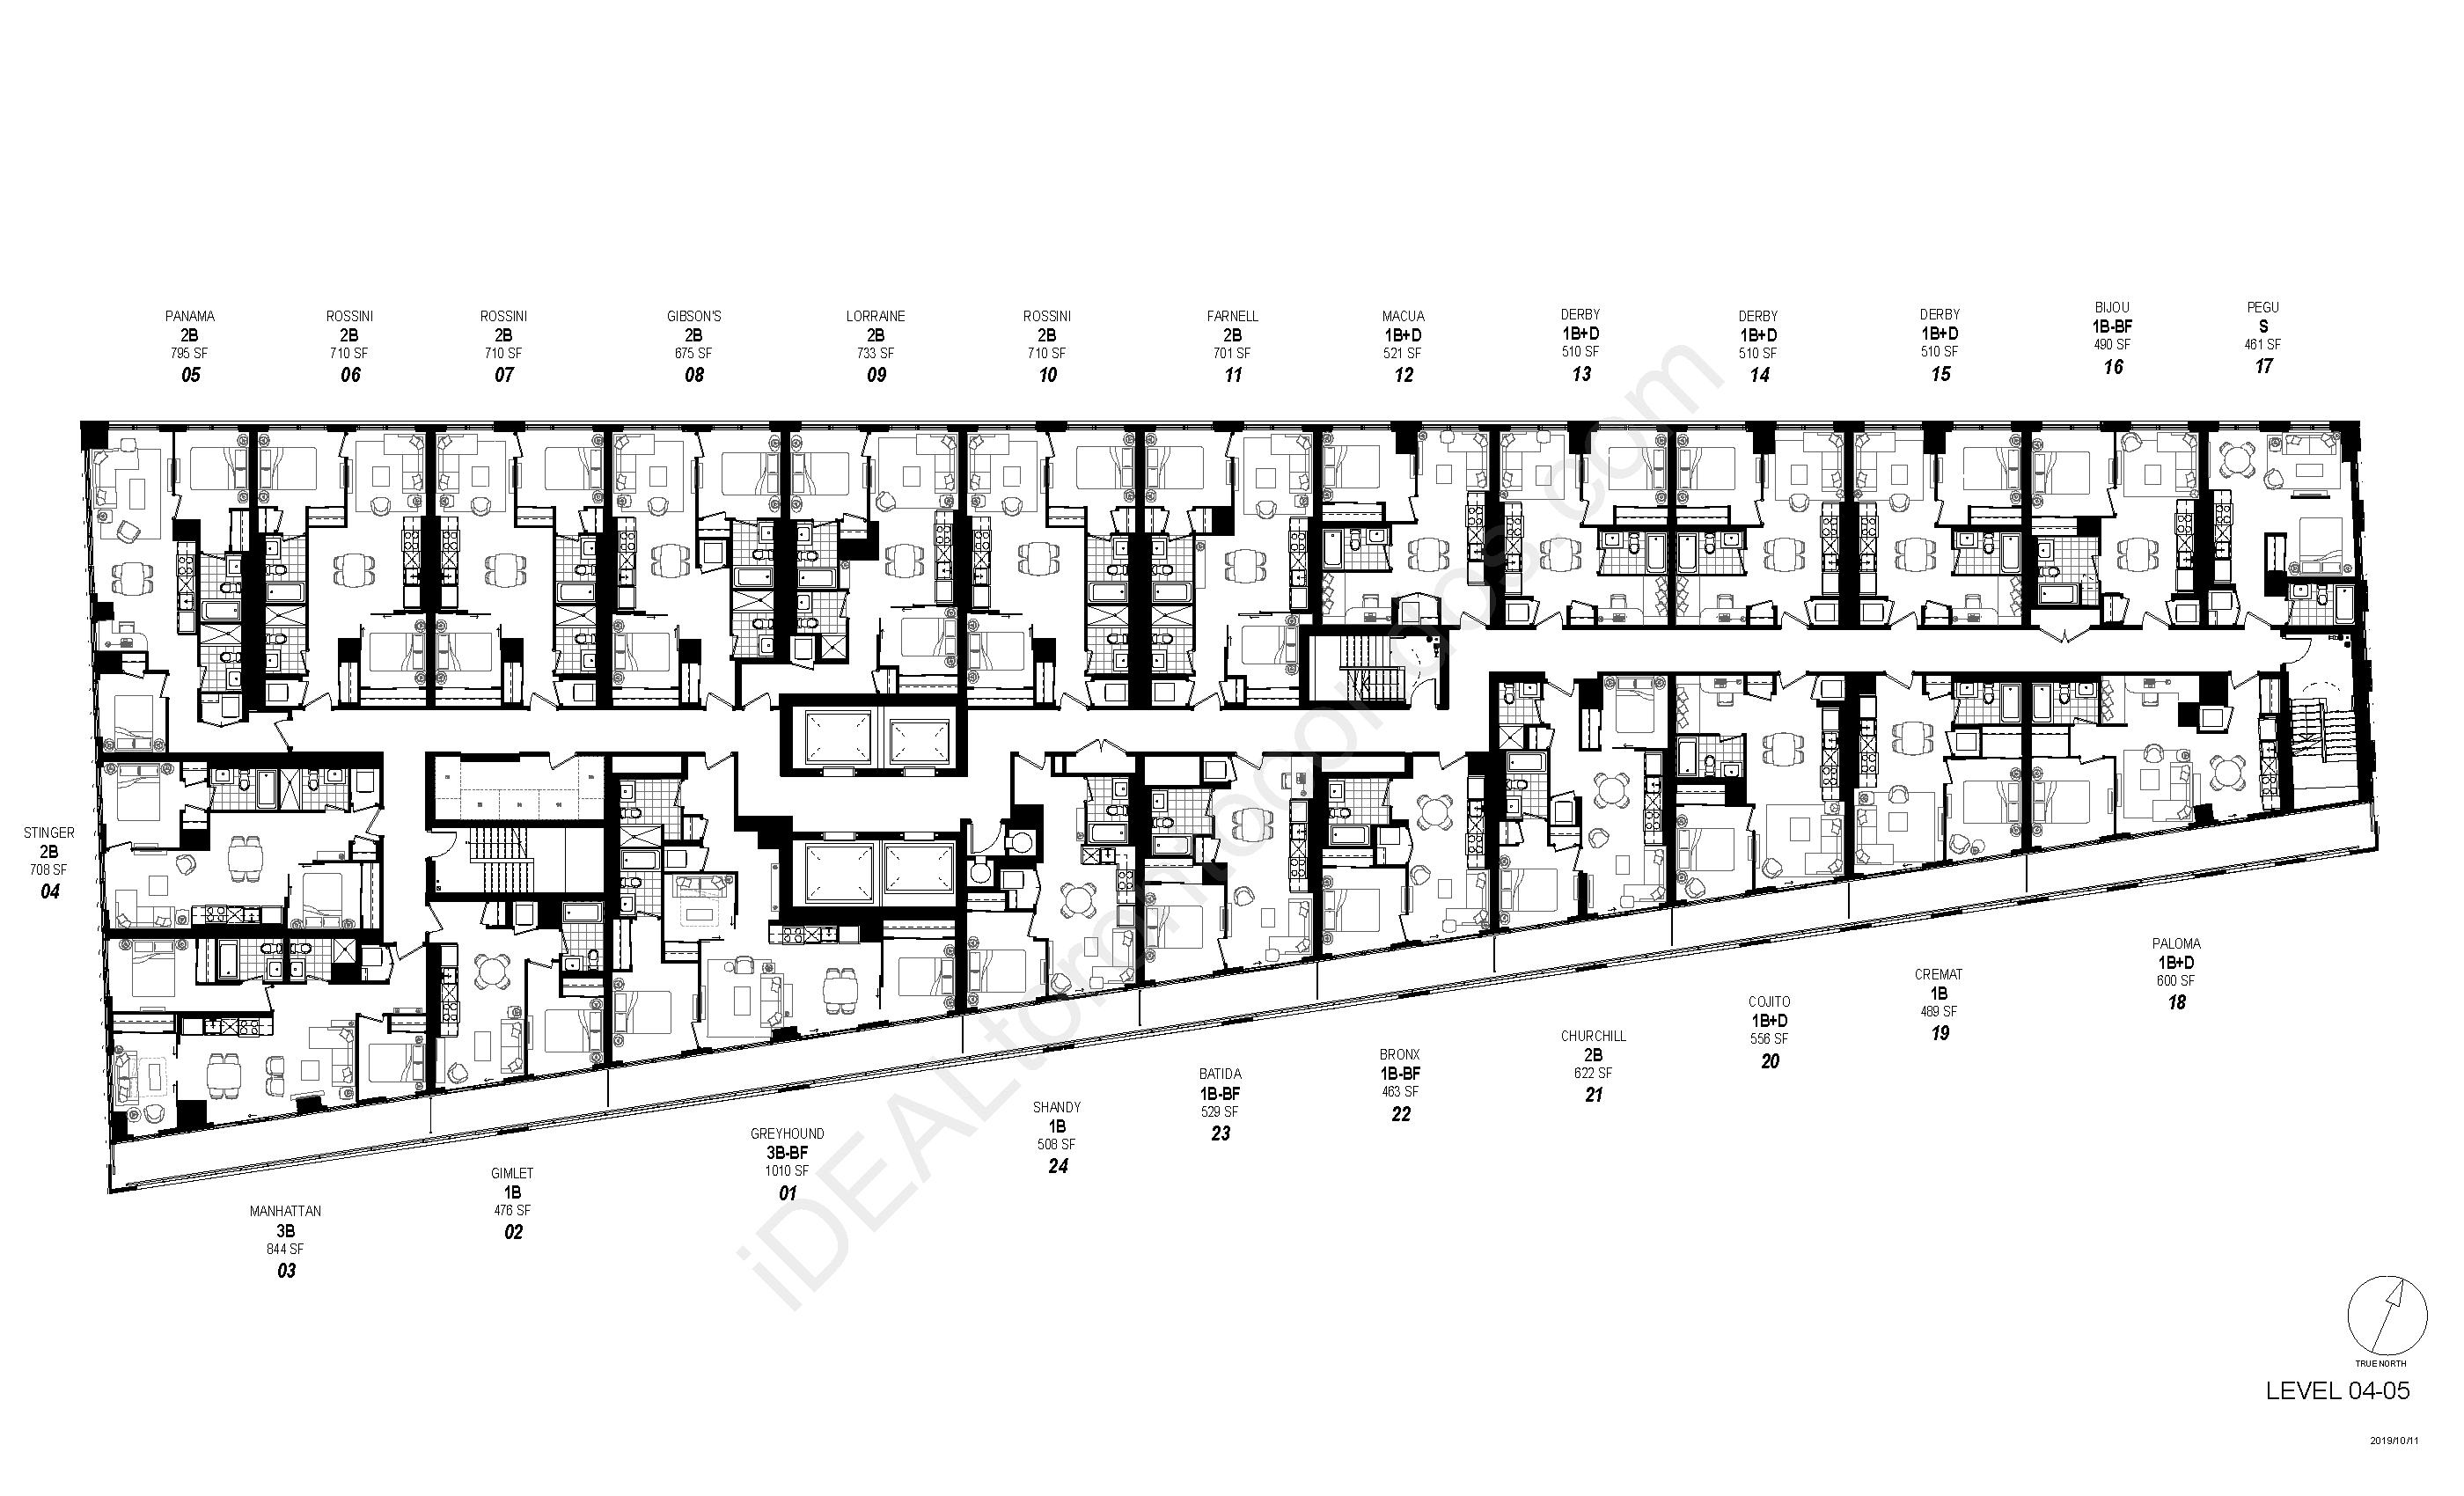 Floorplan Level 04-05